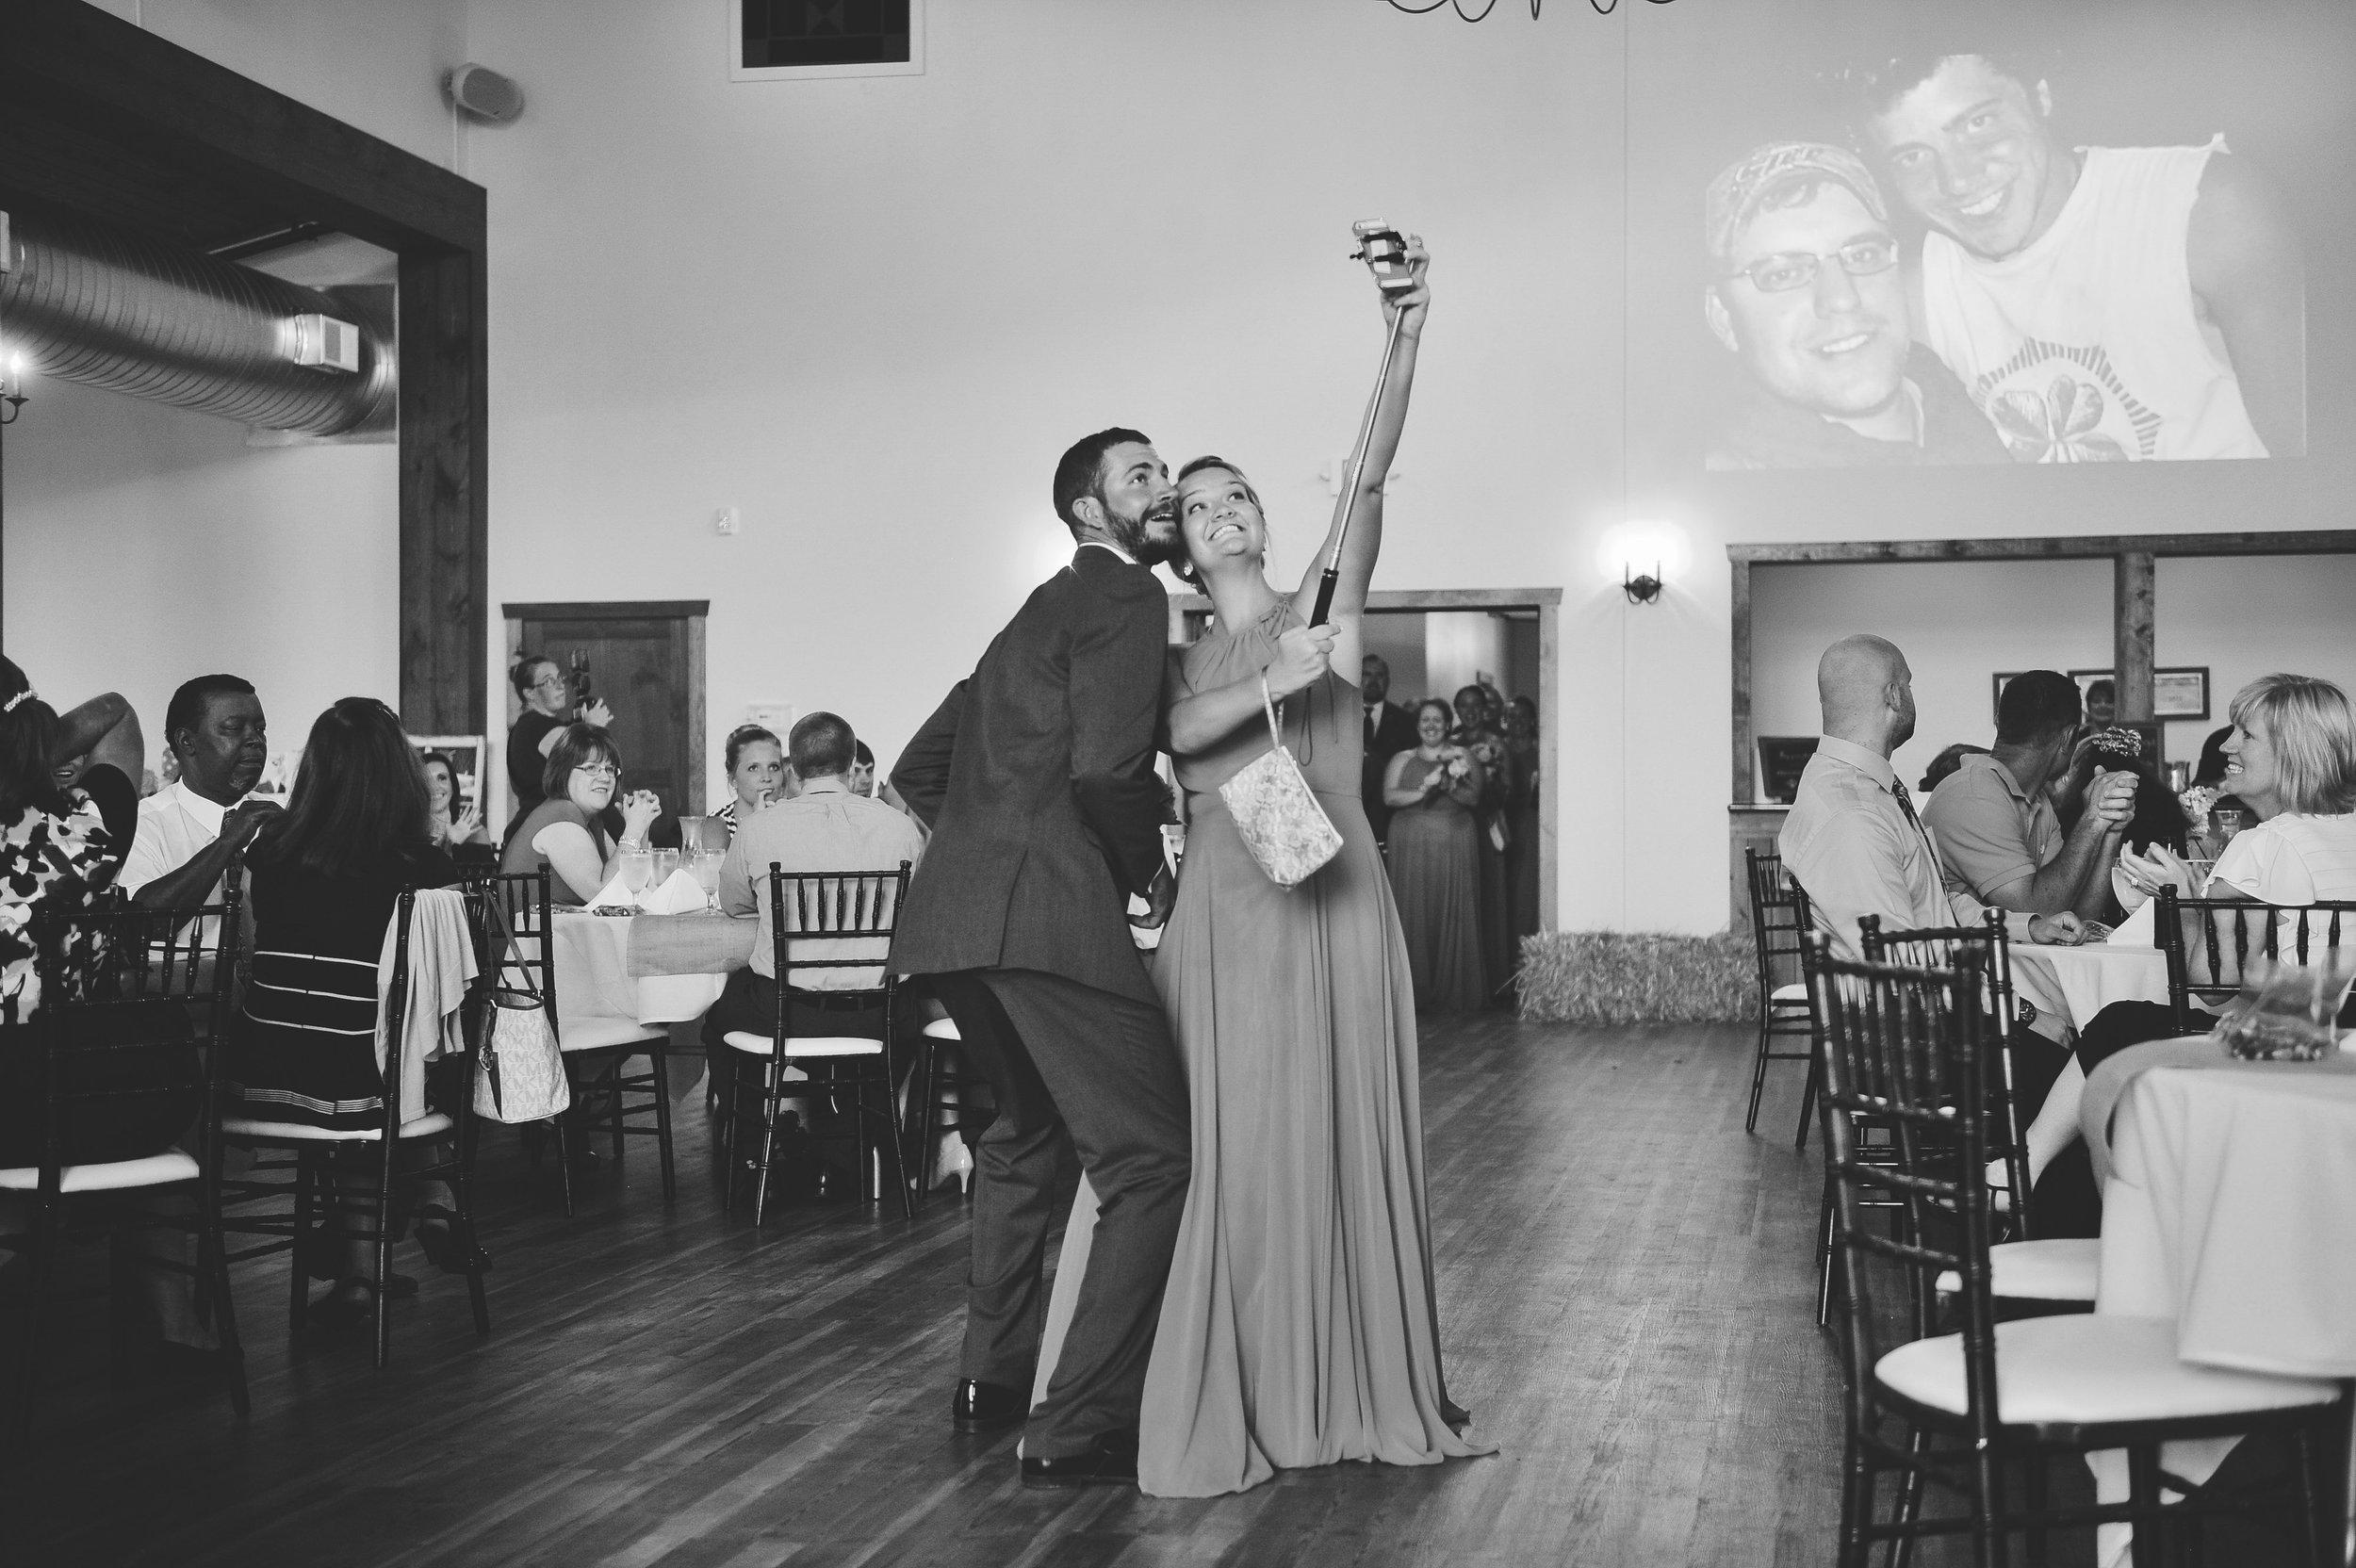 hornbacker-garden-barn-wedding-photo